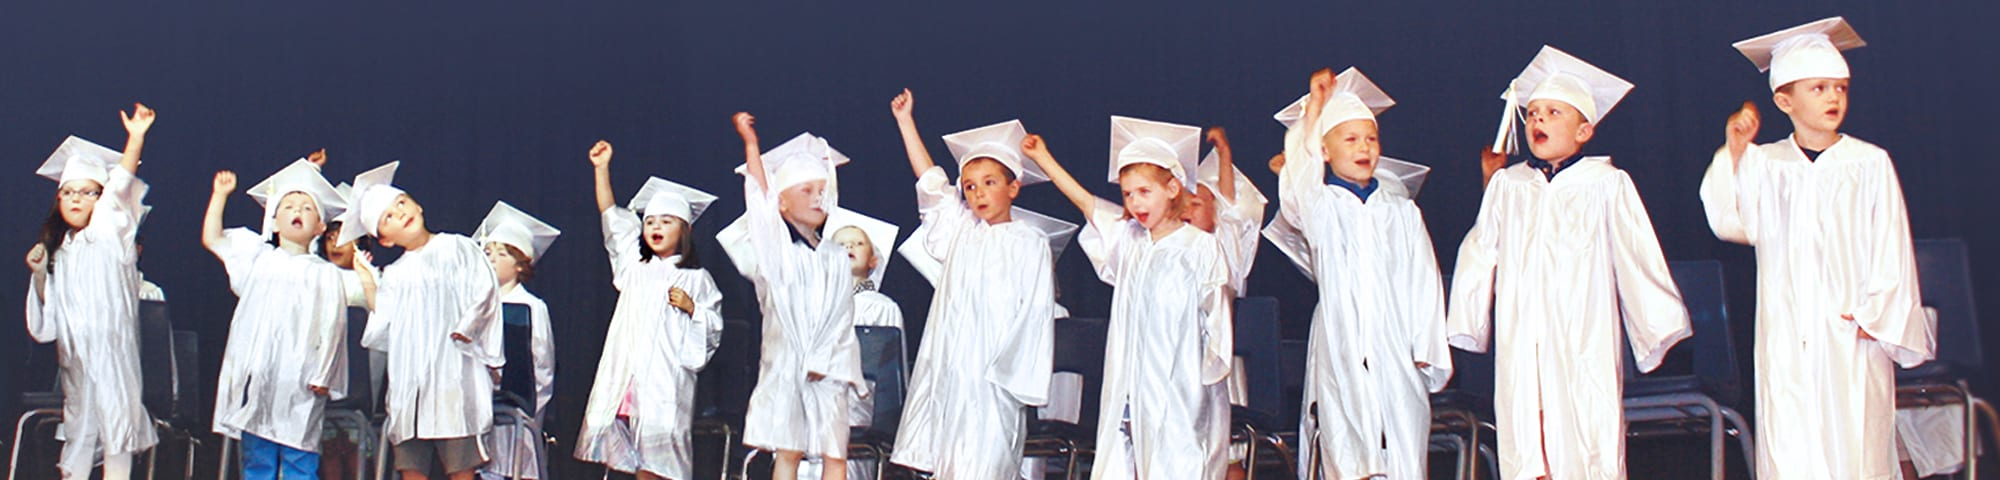 Kiddi Kollege Graduation Stage